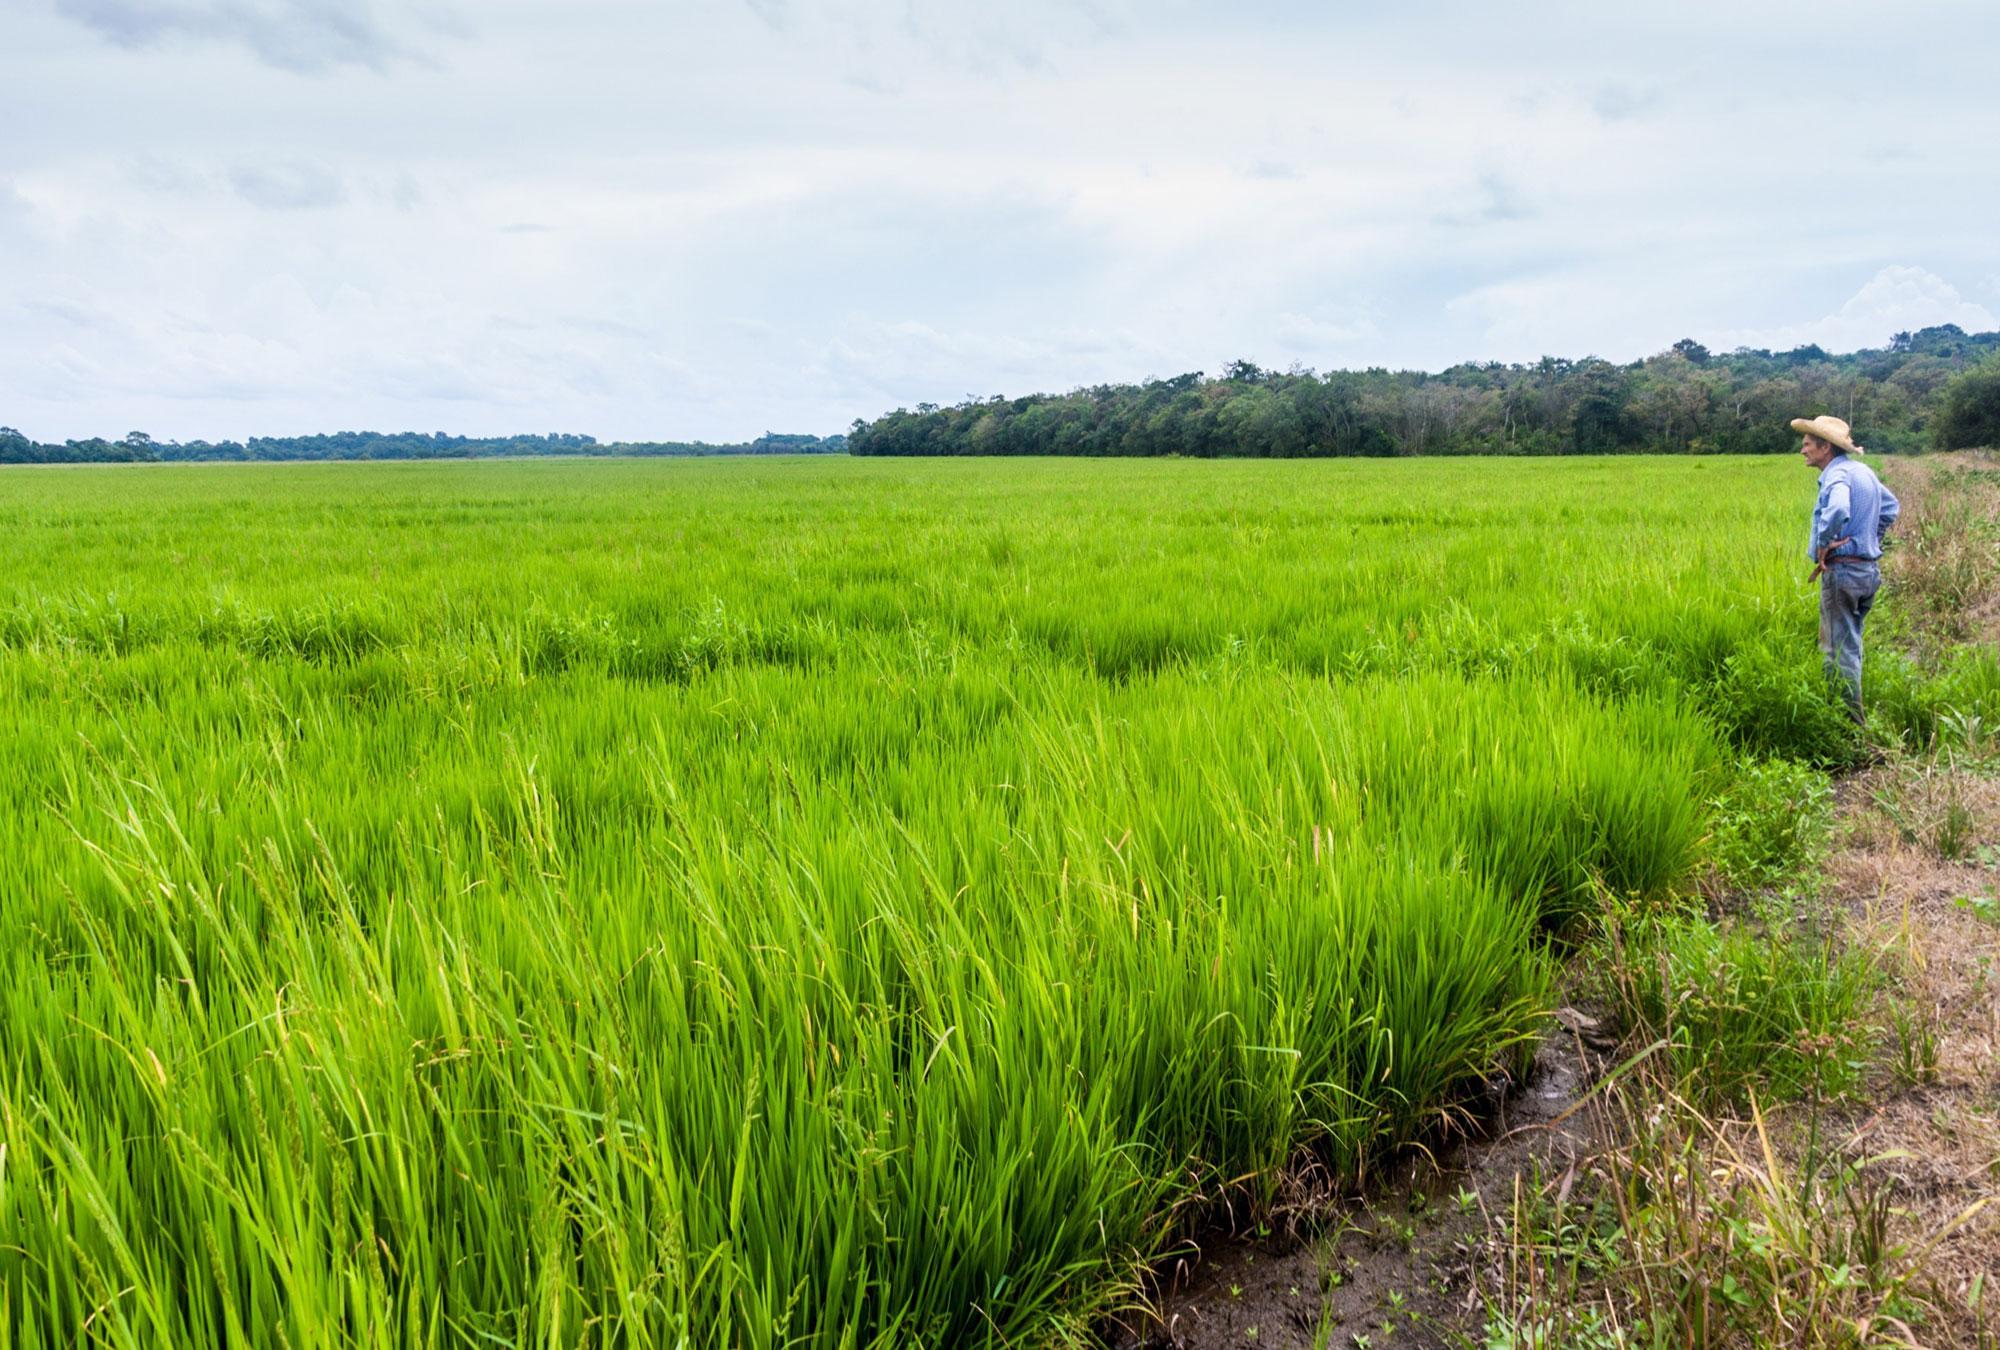 Farmer stands in a field